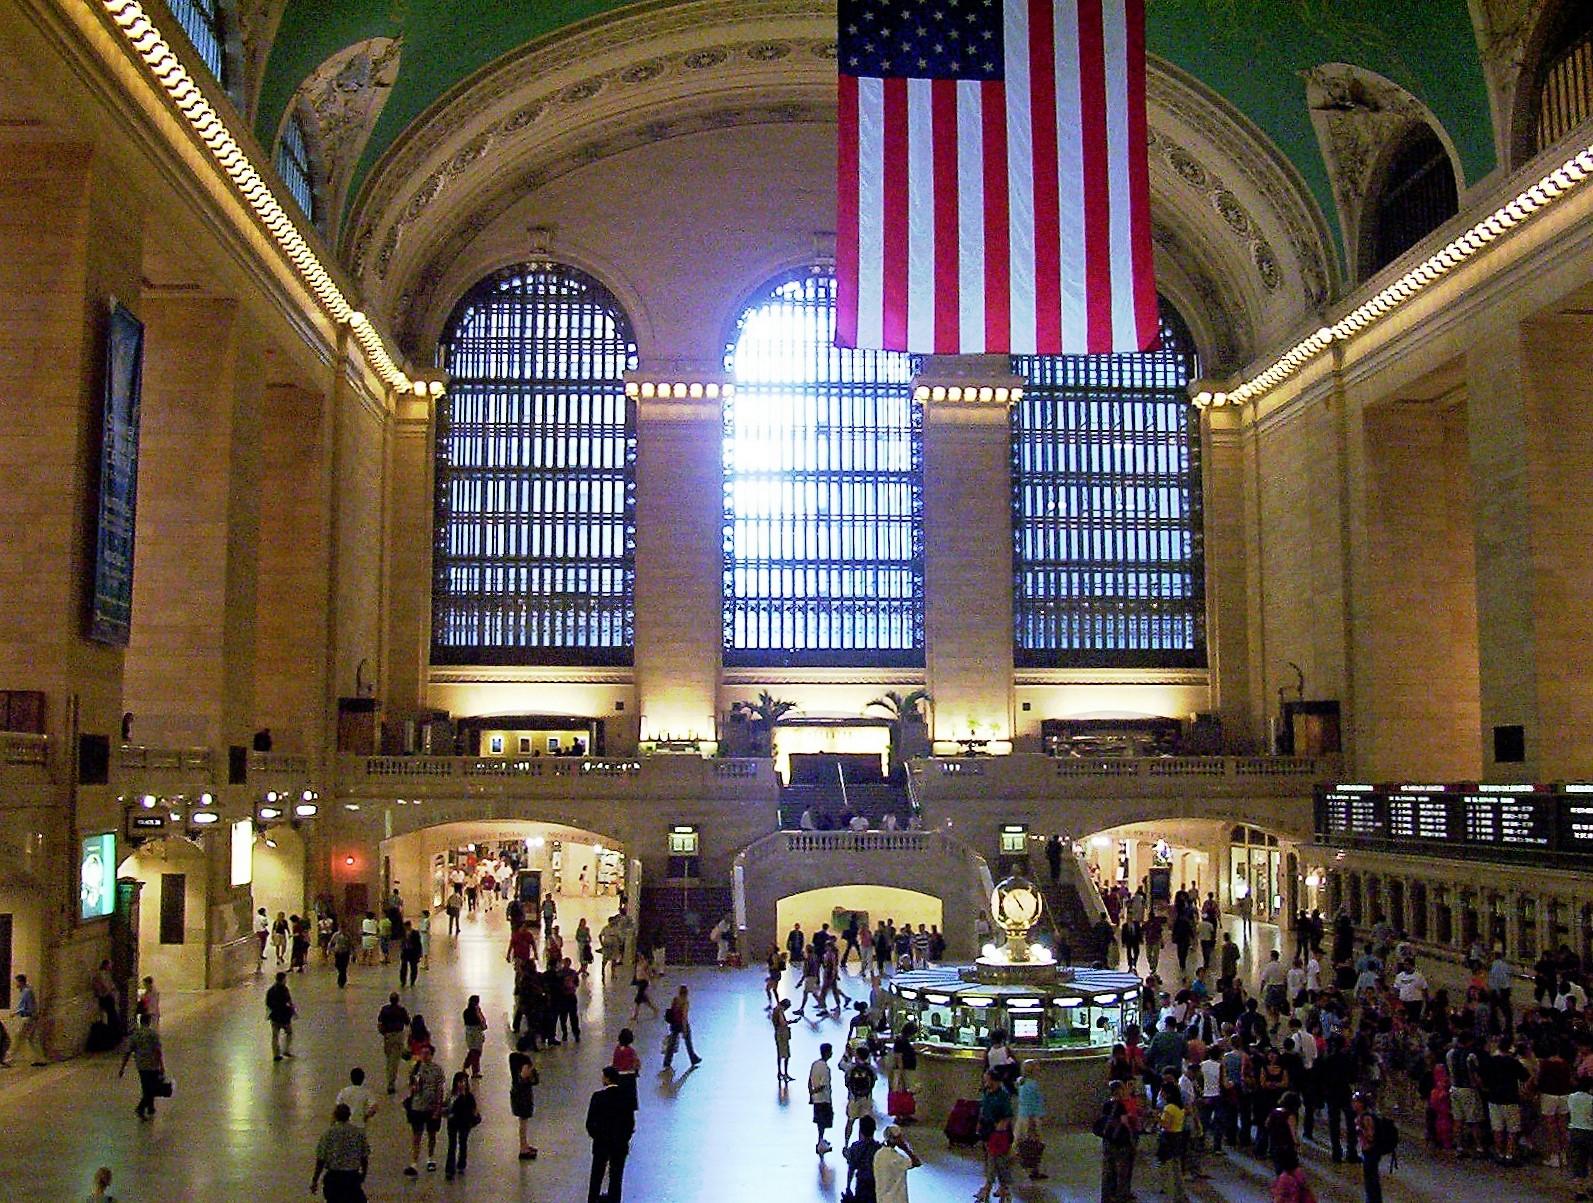 New York Grand Central Station.